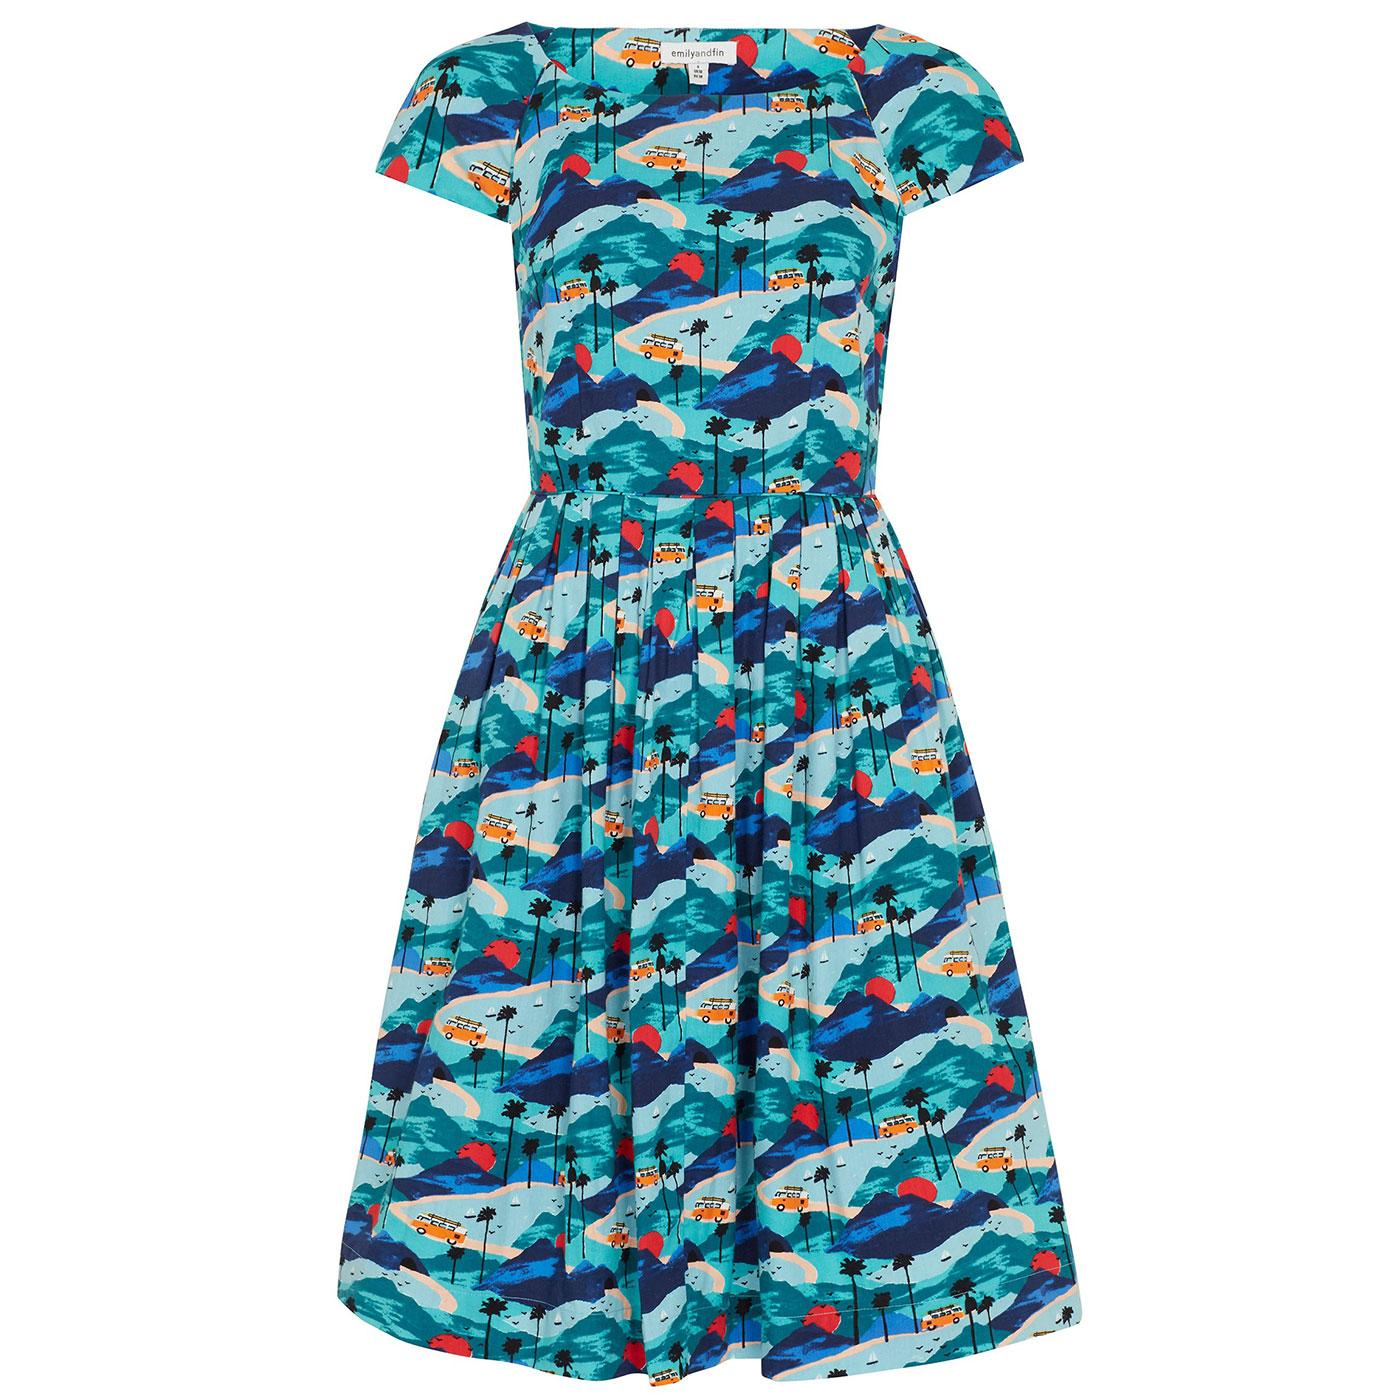 Claudia EMILY & FIN Retro Road Trippin' Dress